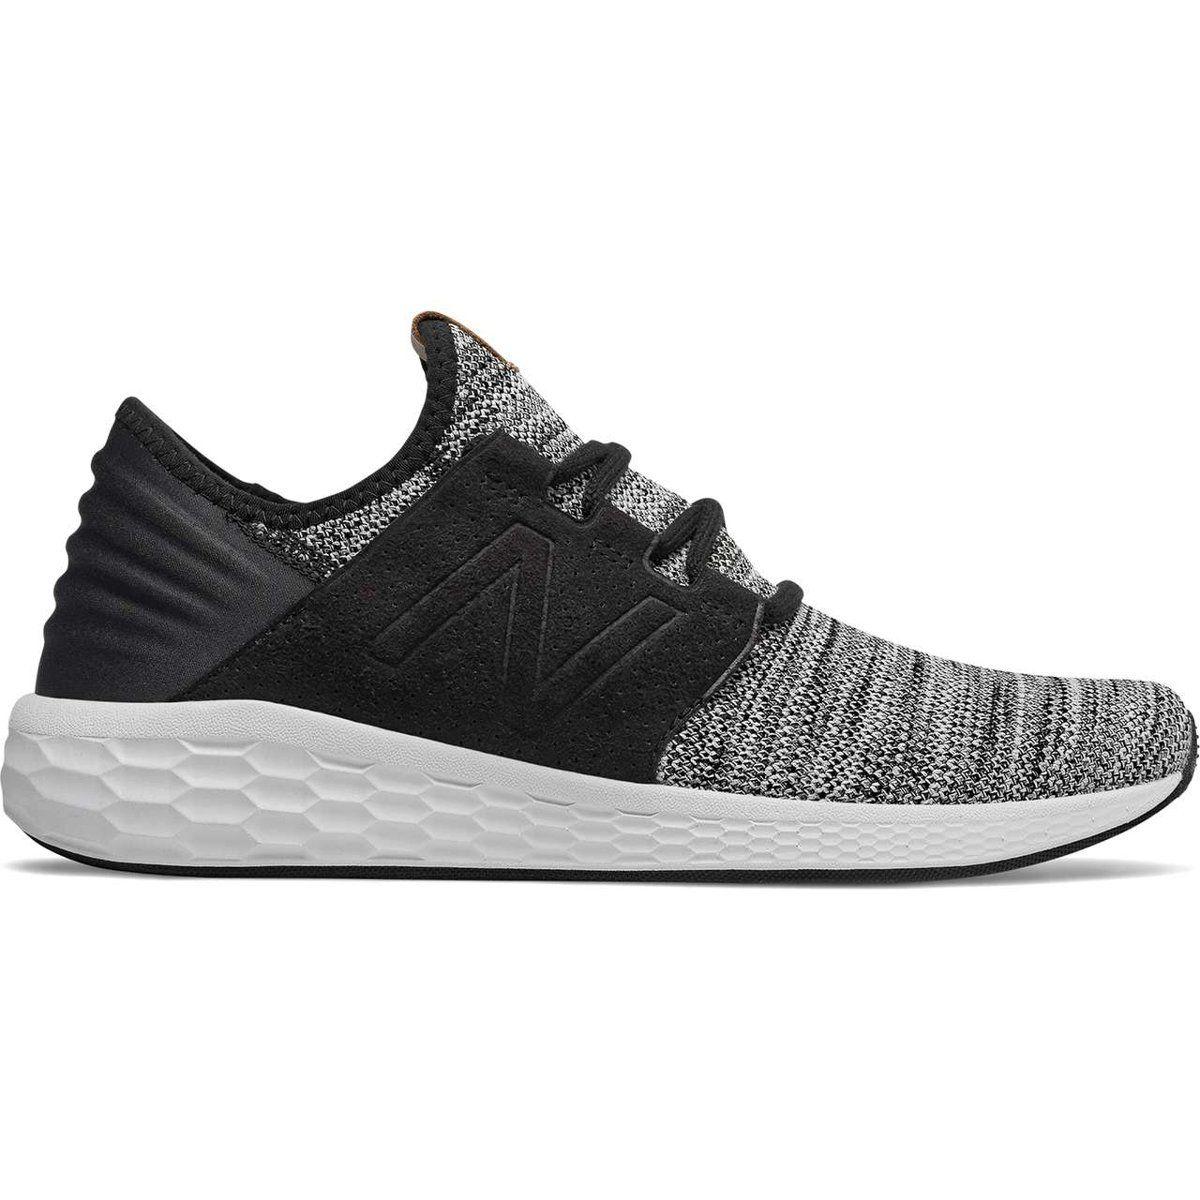 Sportowe Meskie Newbalance New Balance Mcruzkw2 White With Black Running Shoes For Men New Balance Leather Wedding Shoes